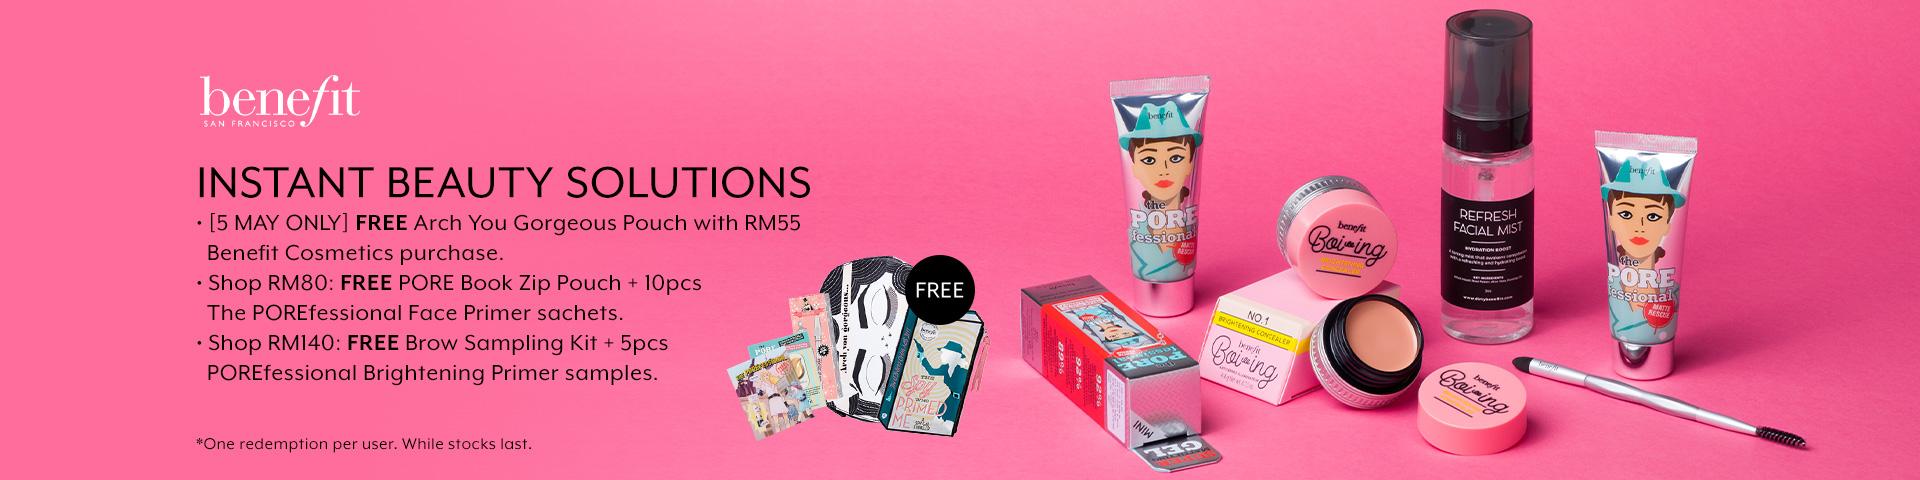 May 2019: Benefit Cosmetics